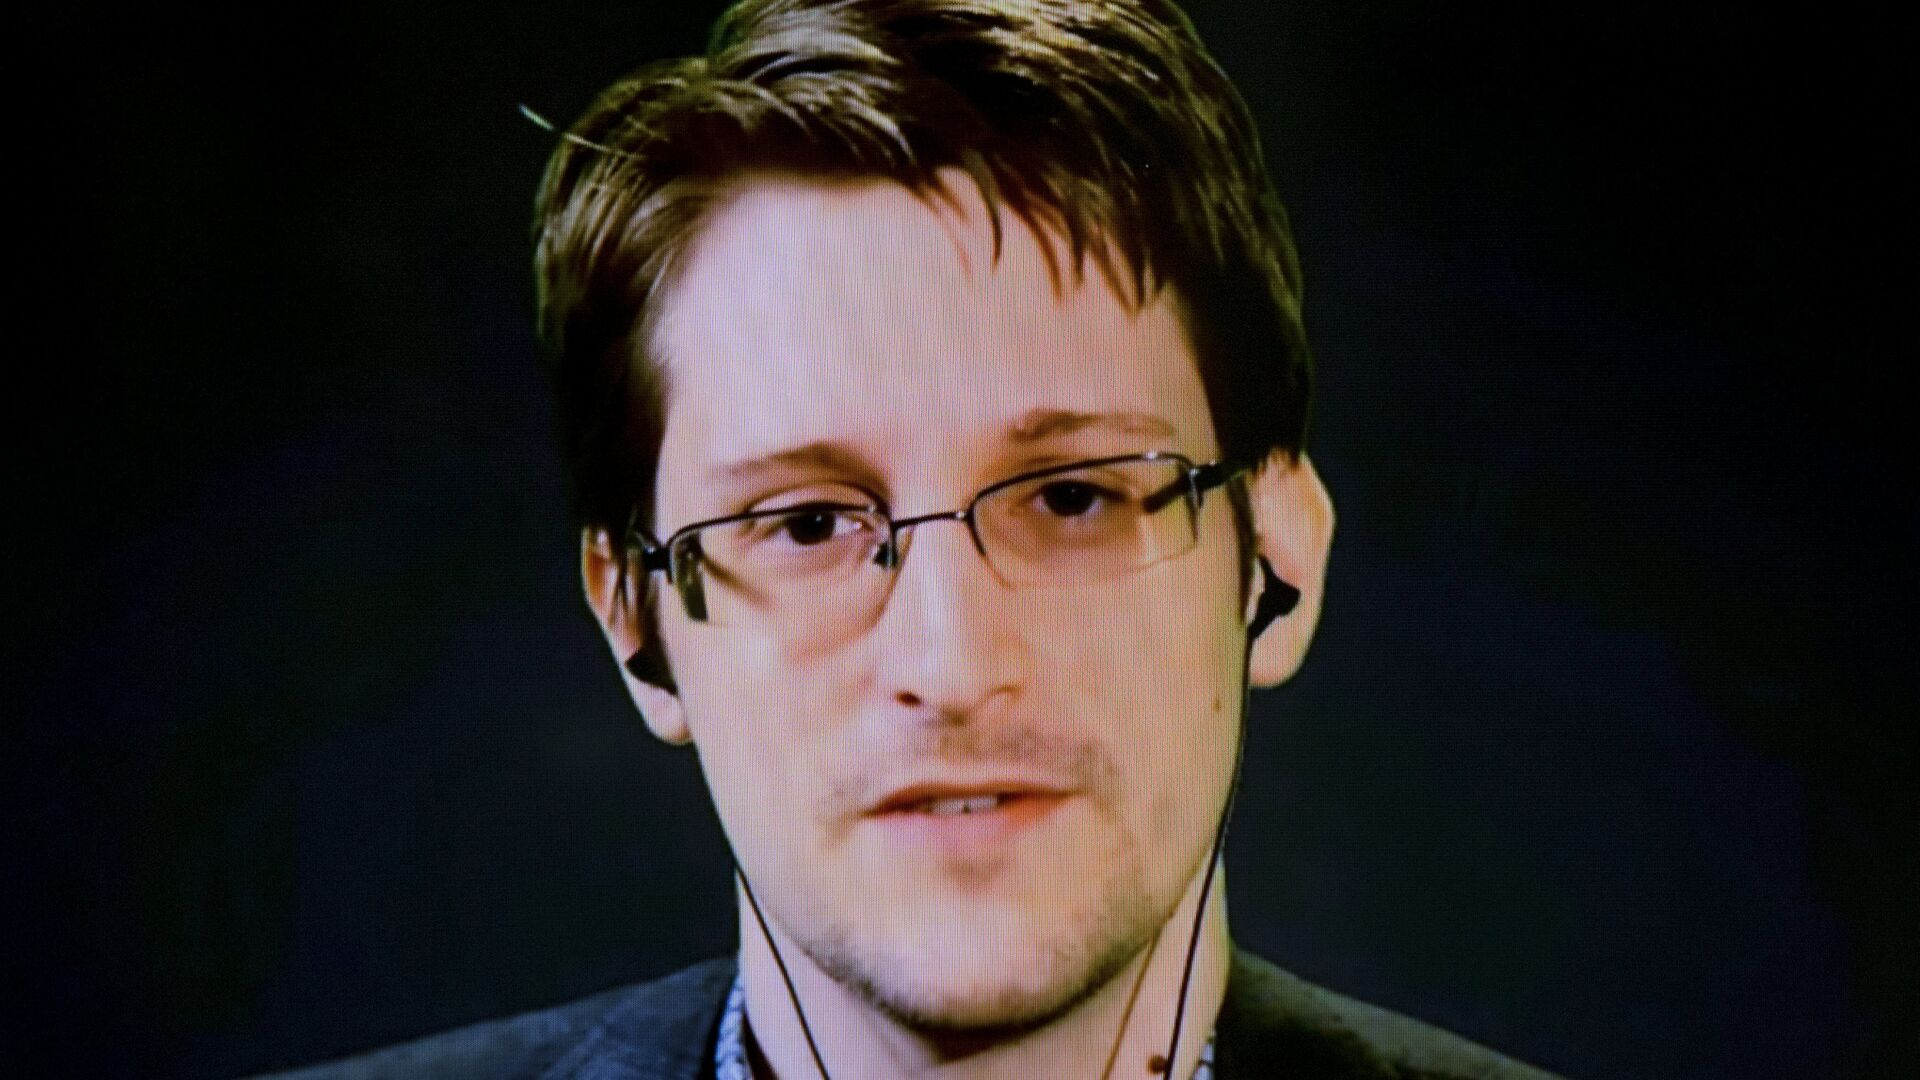 American whistleblower Edward Snowden delivers remarks via video link from Moscow - Sputnik Česká republika, 1920, 27.06.2021